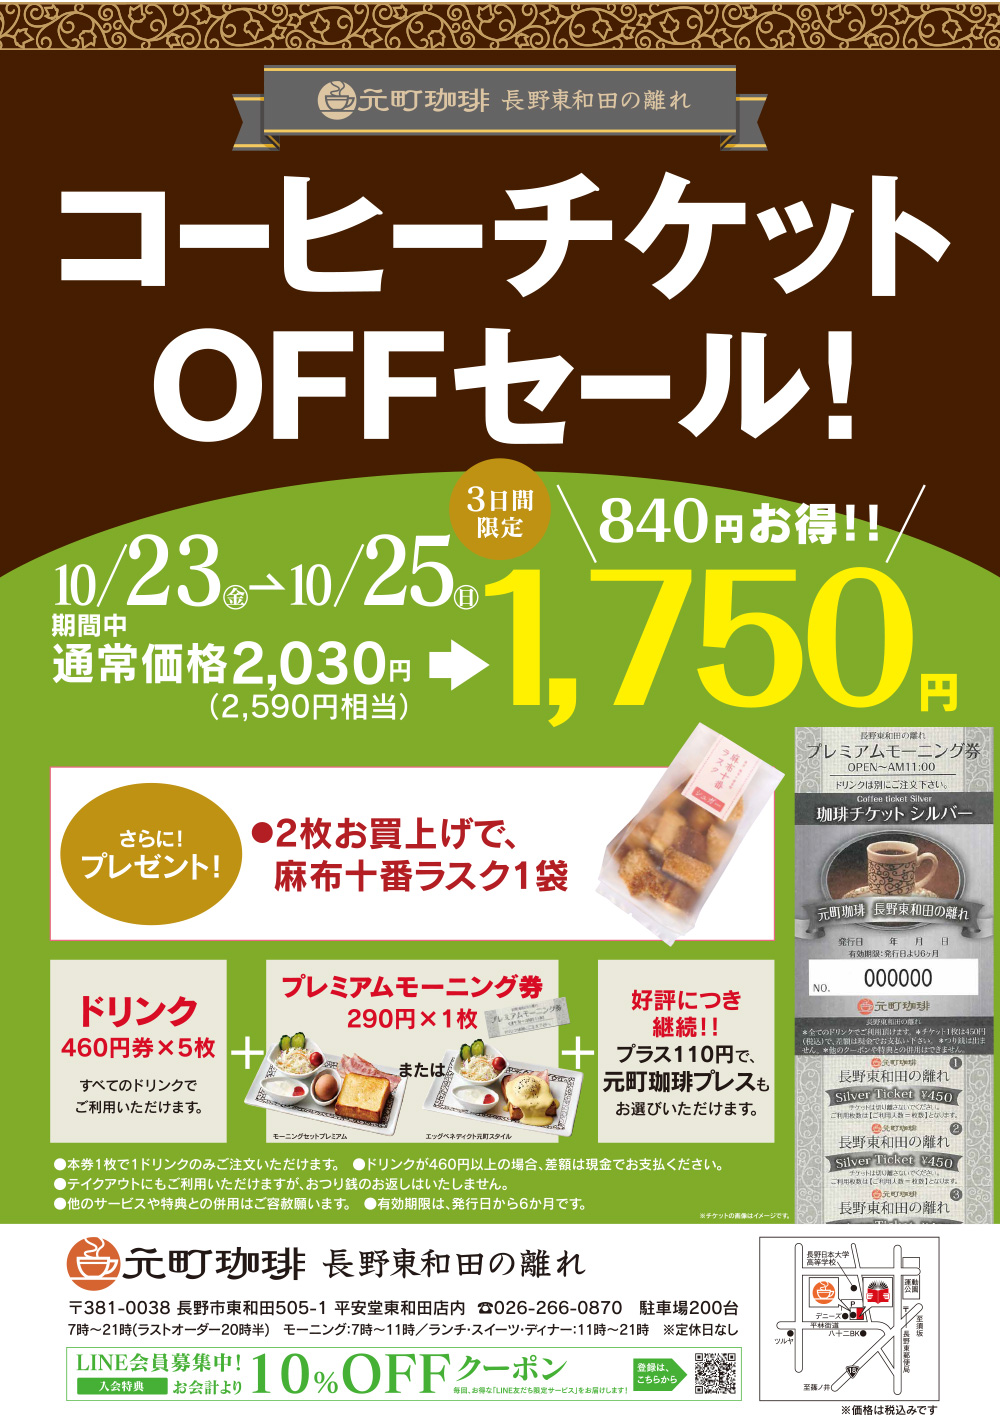 201010_motomachi_ticket